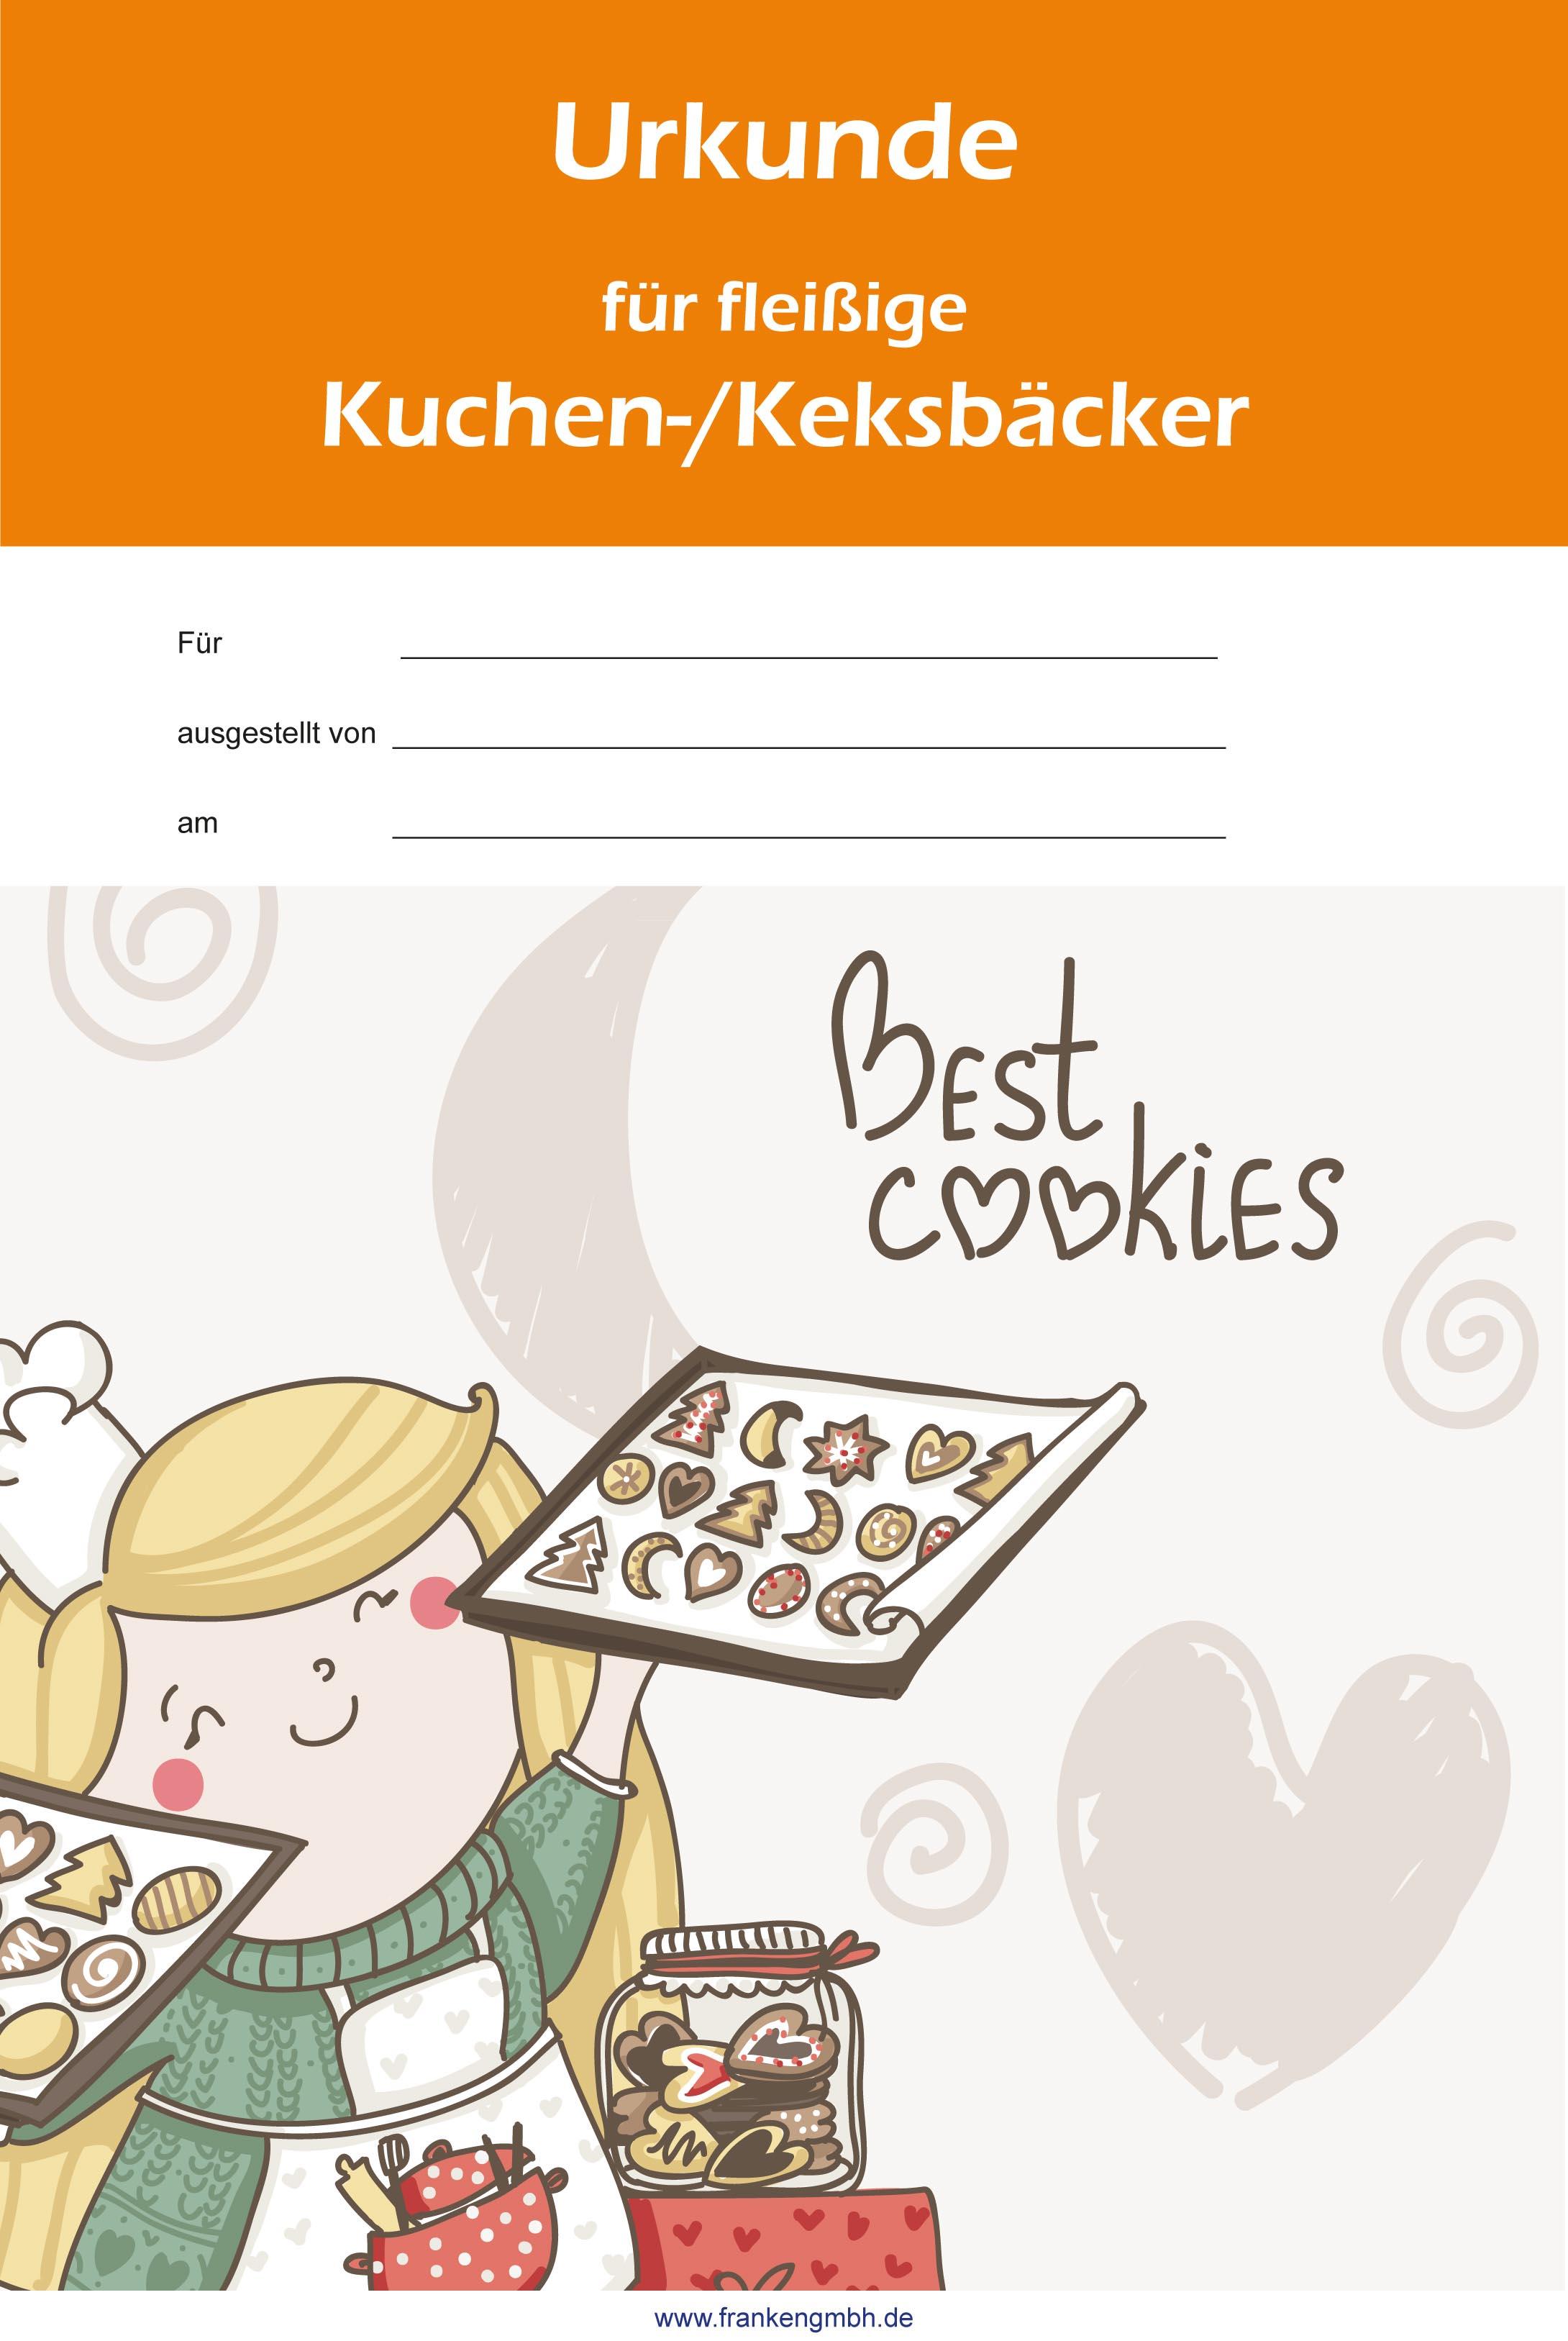 Urkunde Kuchen-/Keksbäcker